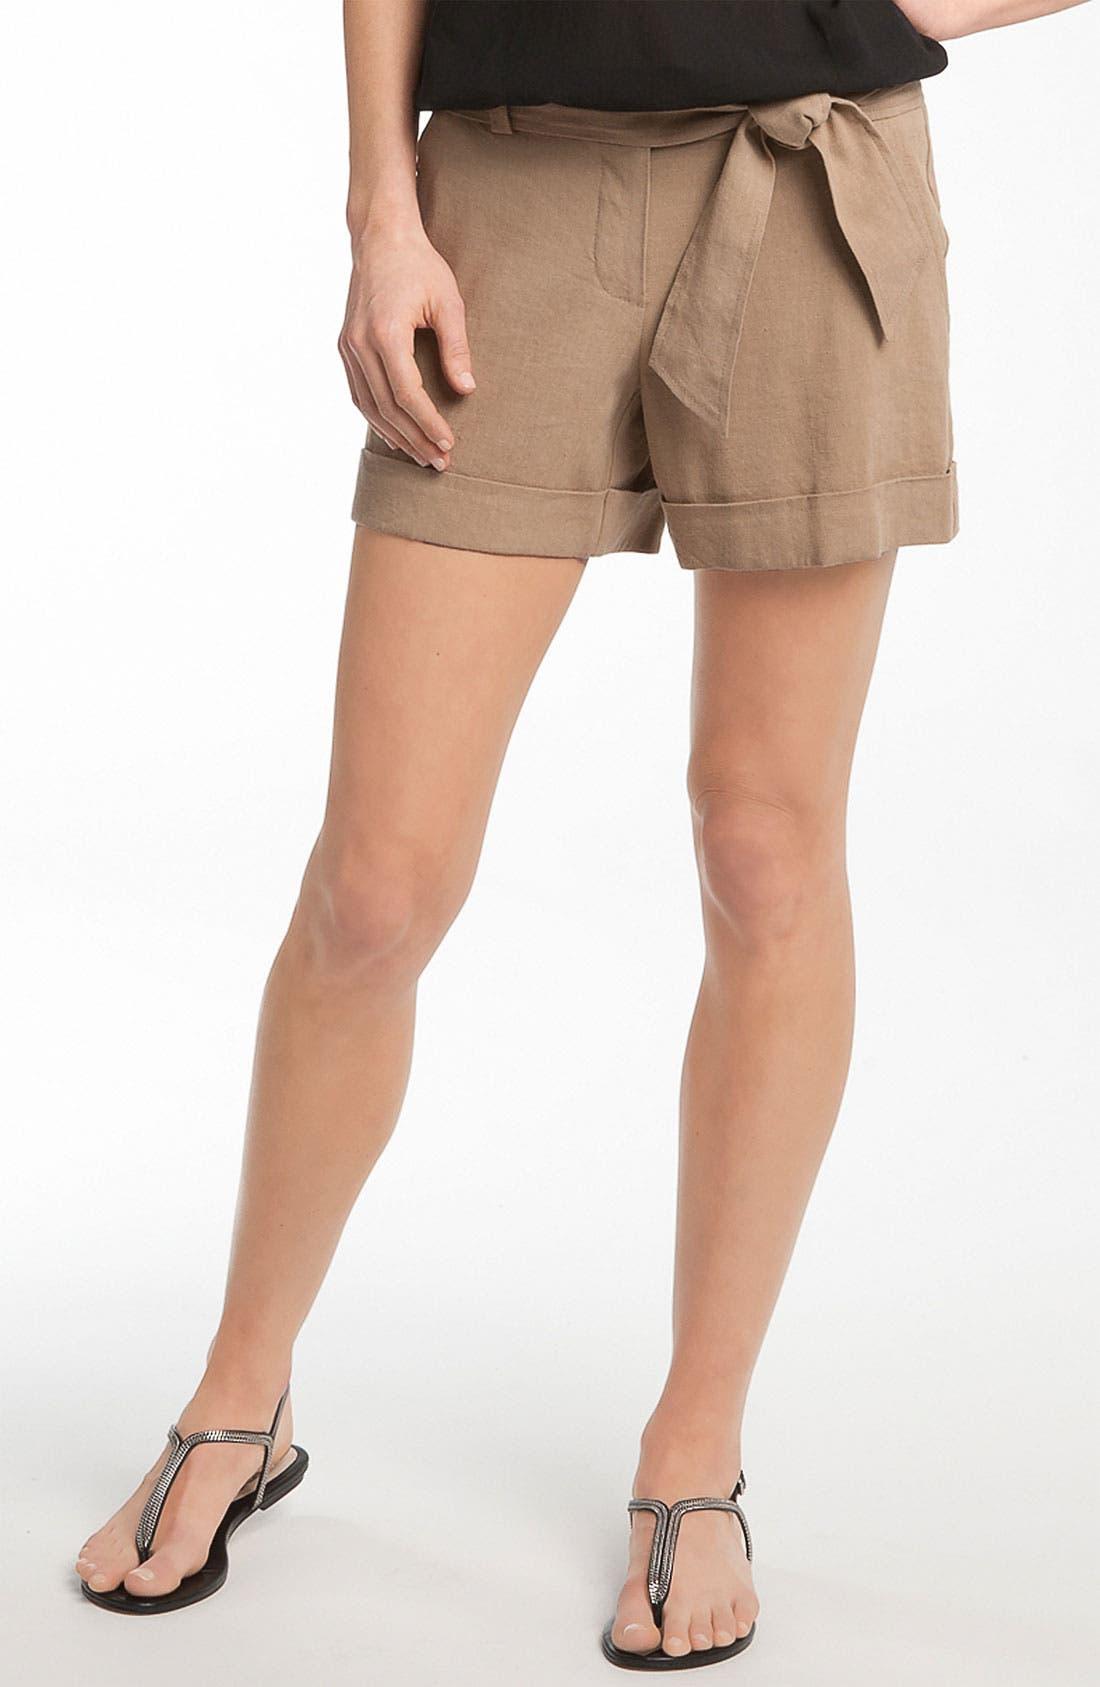 Alternate Image 1 Selected - Trina Turk 'Alto Cinco' Cuff Shorts